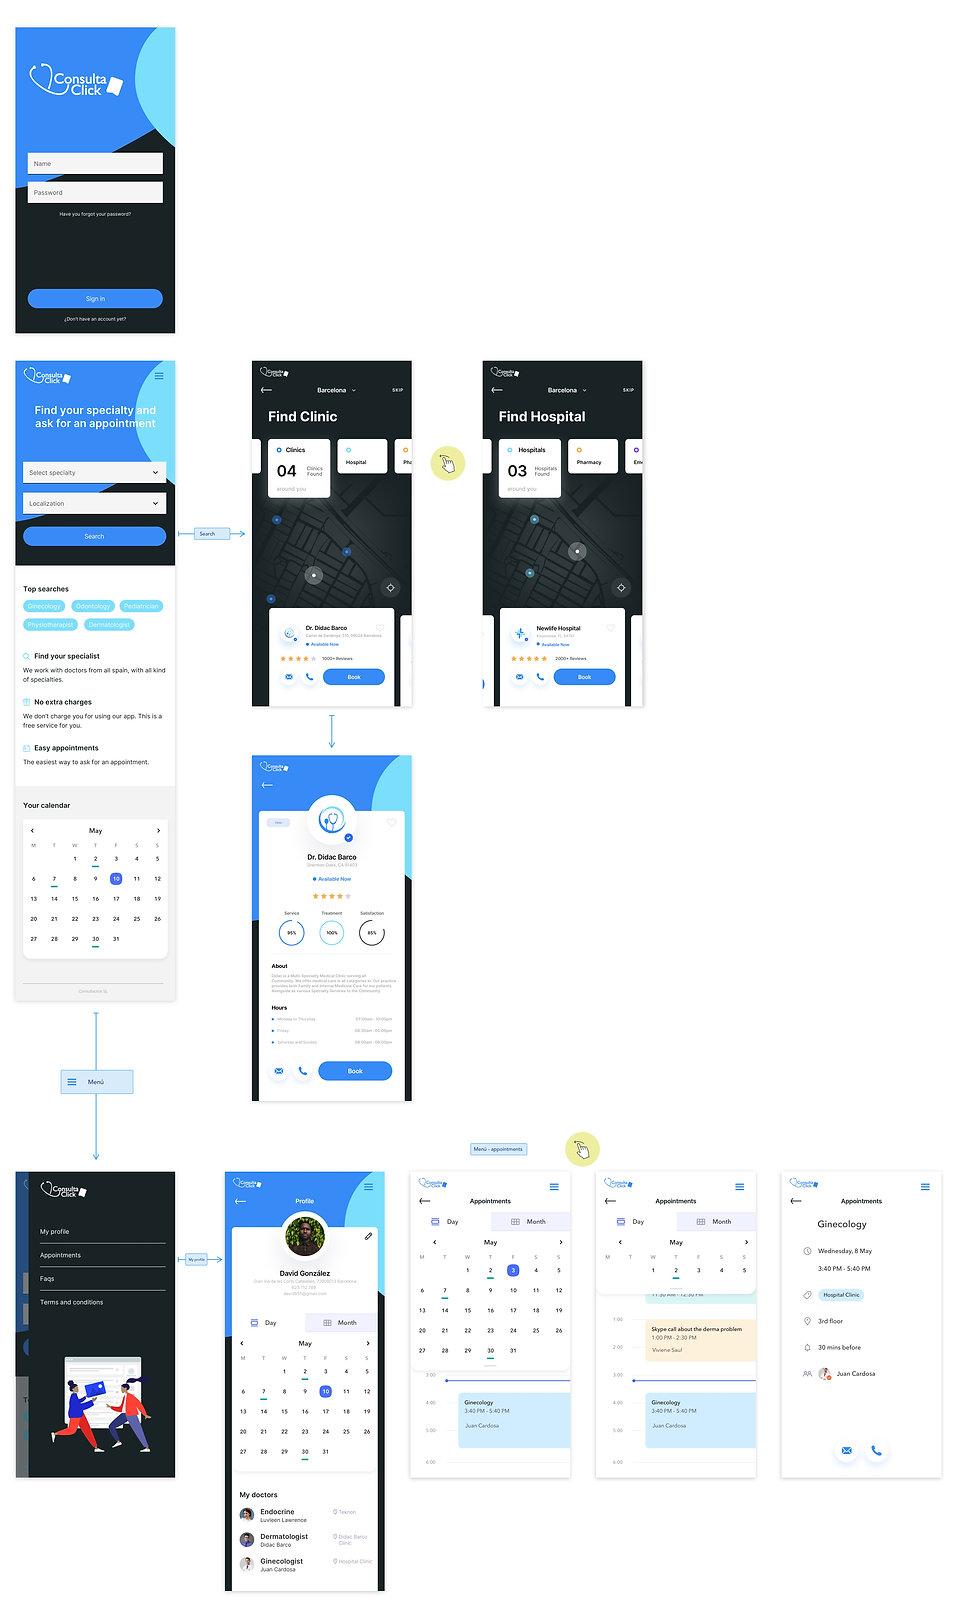 consultaclick-pantallas.jpg